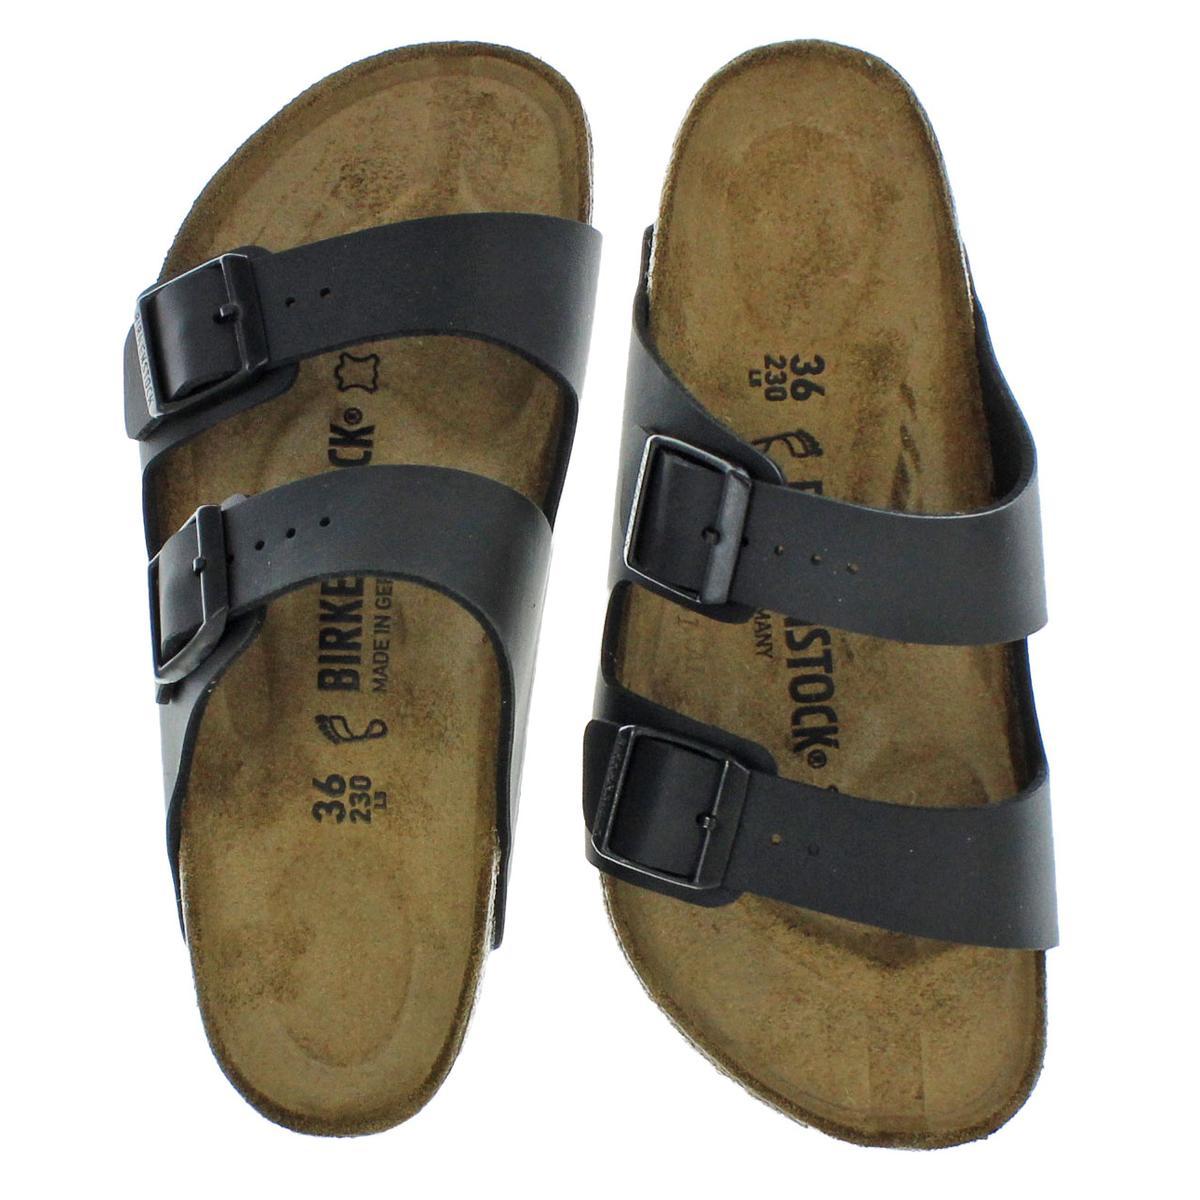 Birkenstock-Women-039-s-Arizona-Double-Buckle-Cork-Sandals thumbnail 5